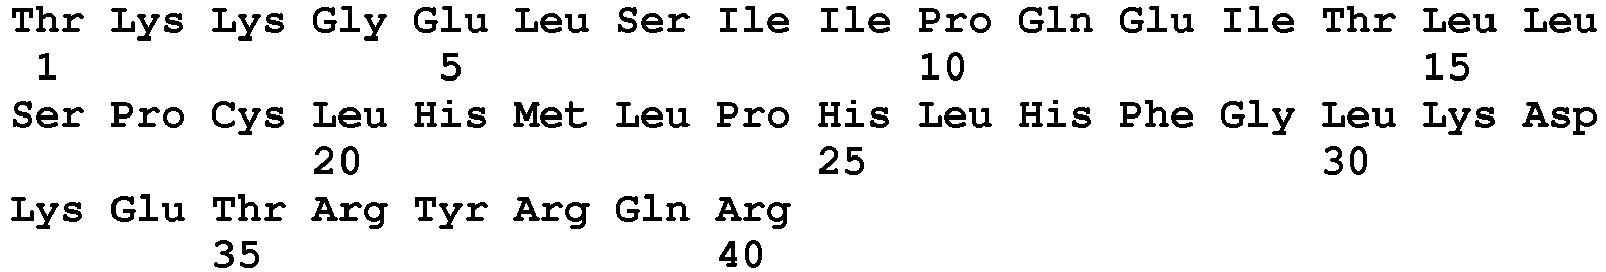 Figure imgb0138